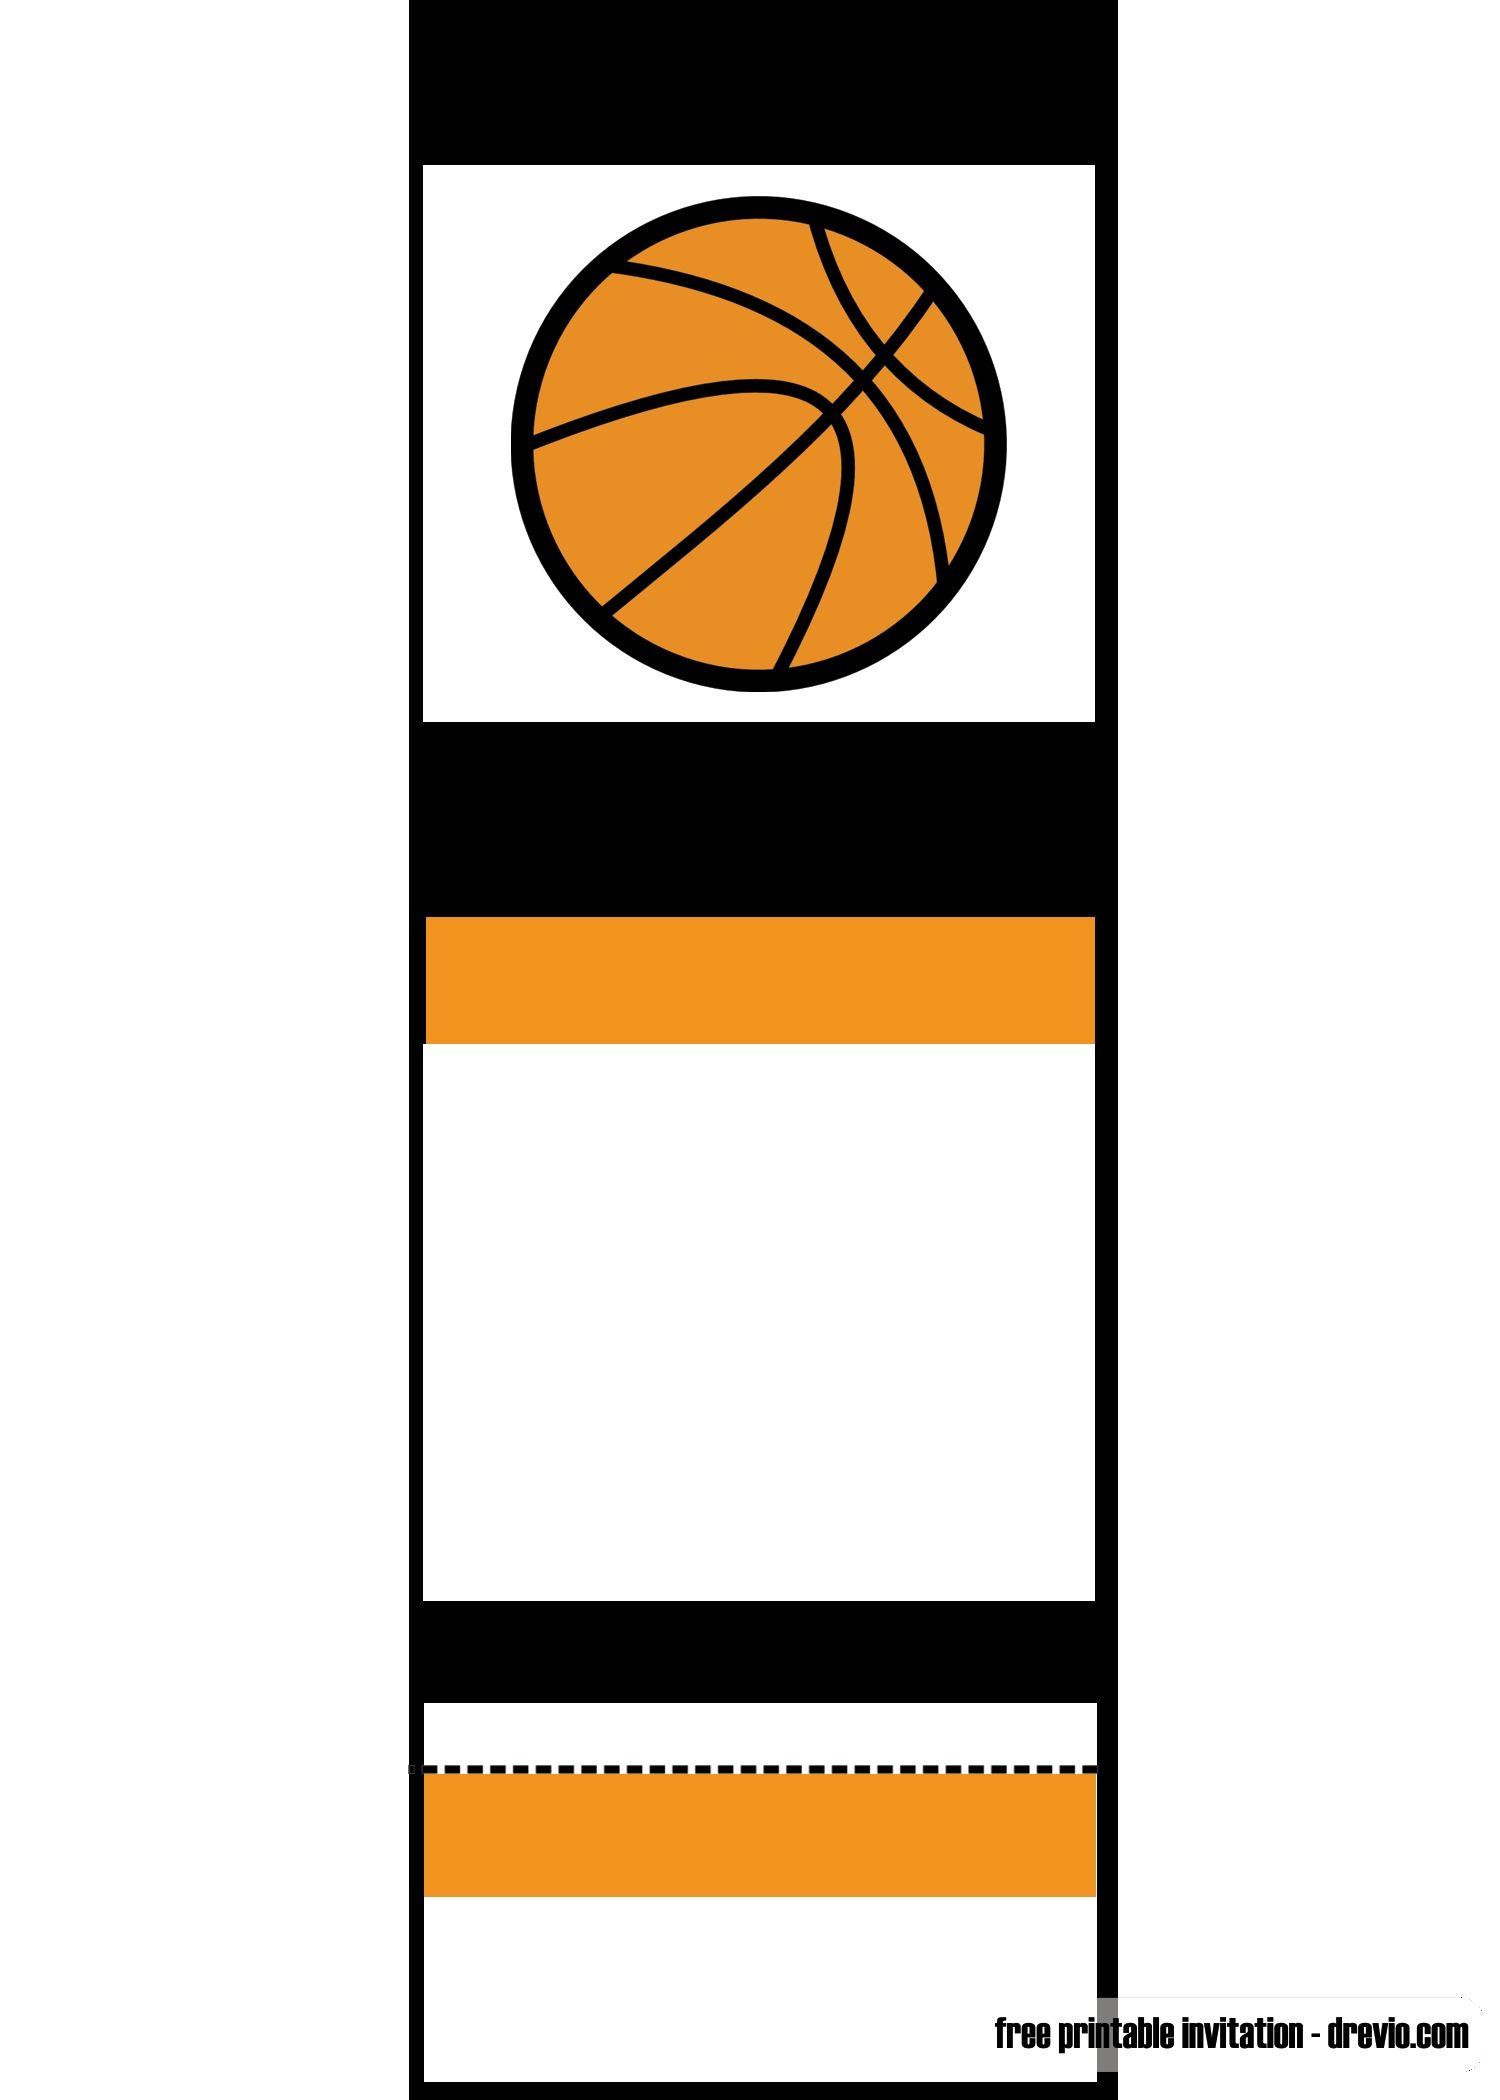 Free Printable Basketball Ticket Invitation Template